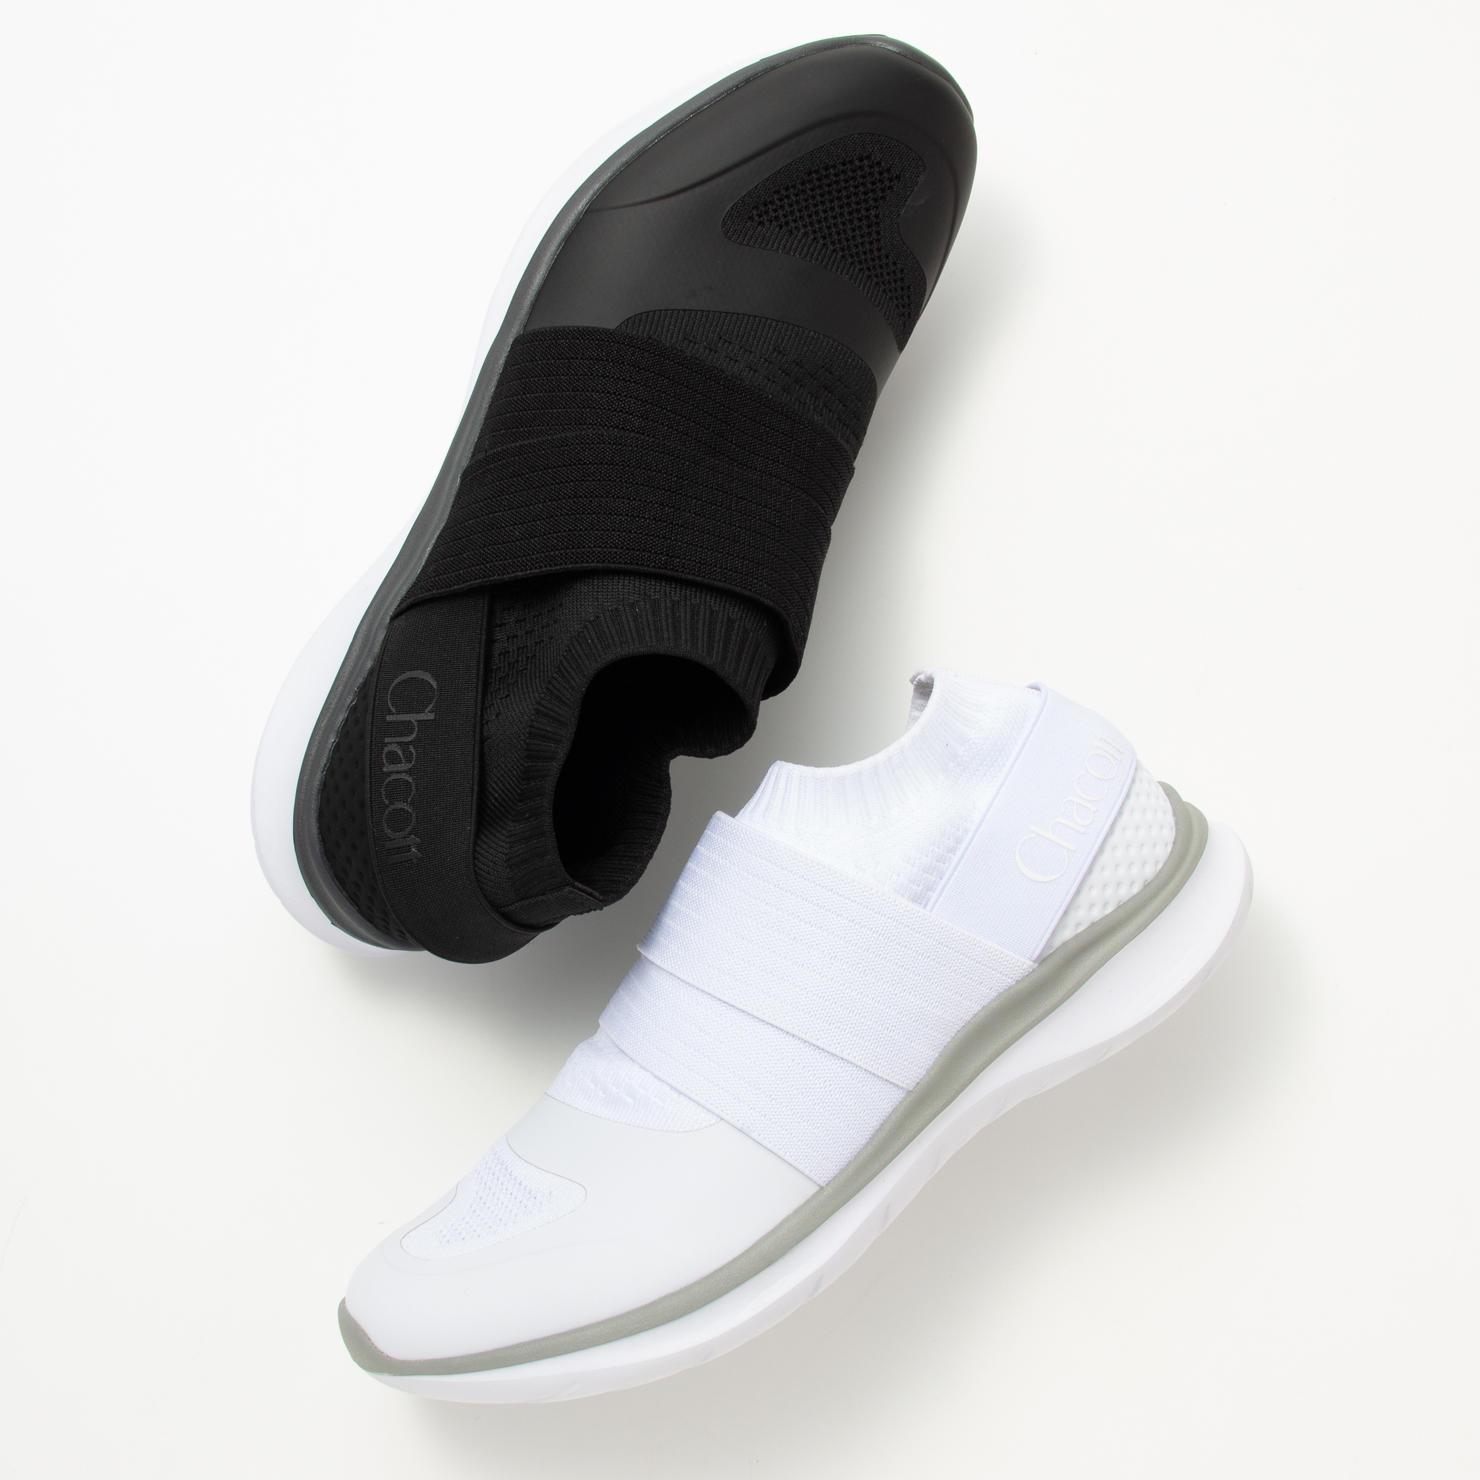 0417_sneaker_balance_low01.jpg